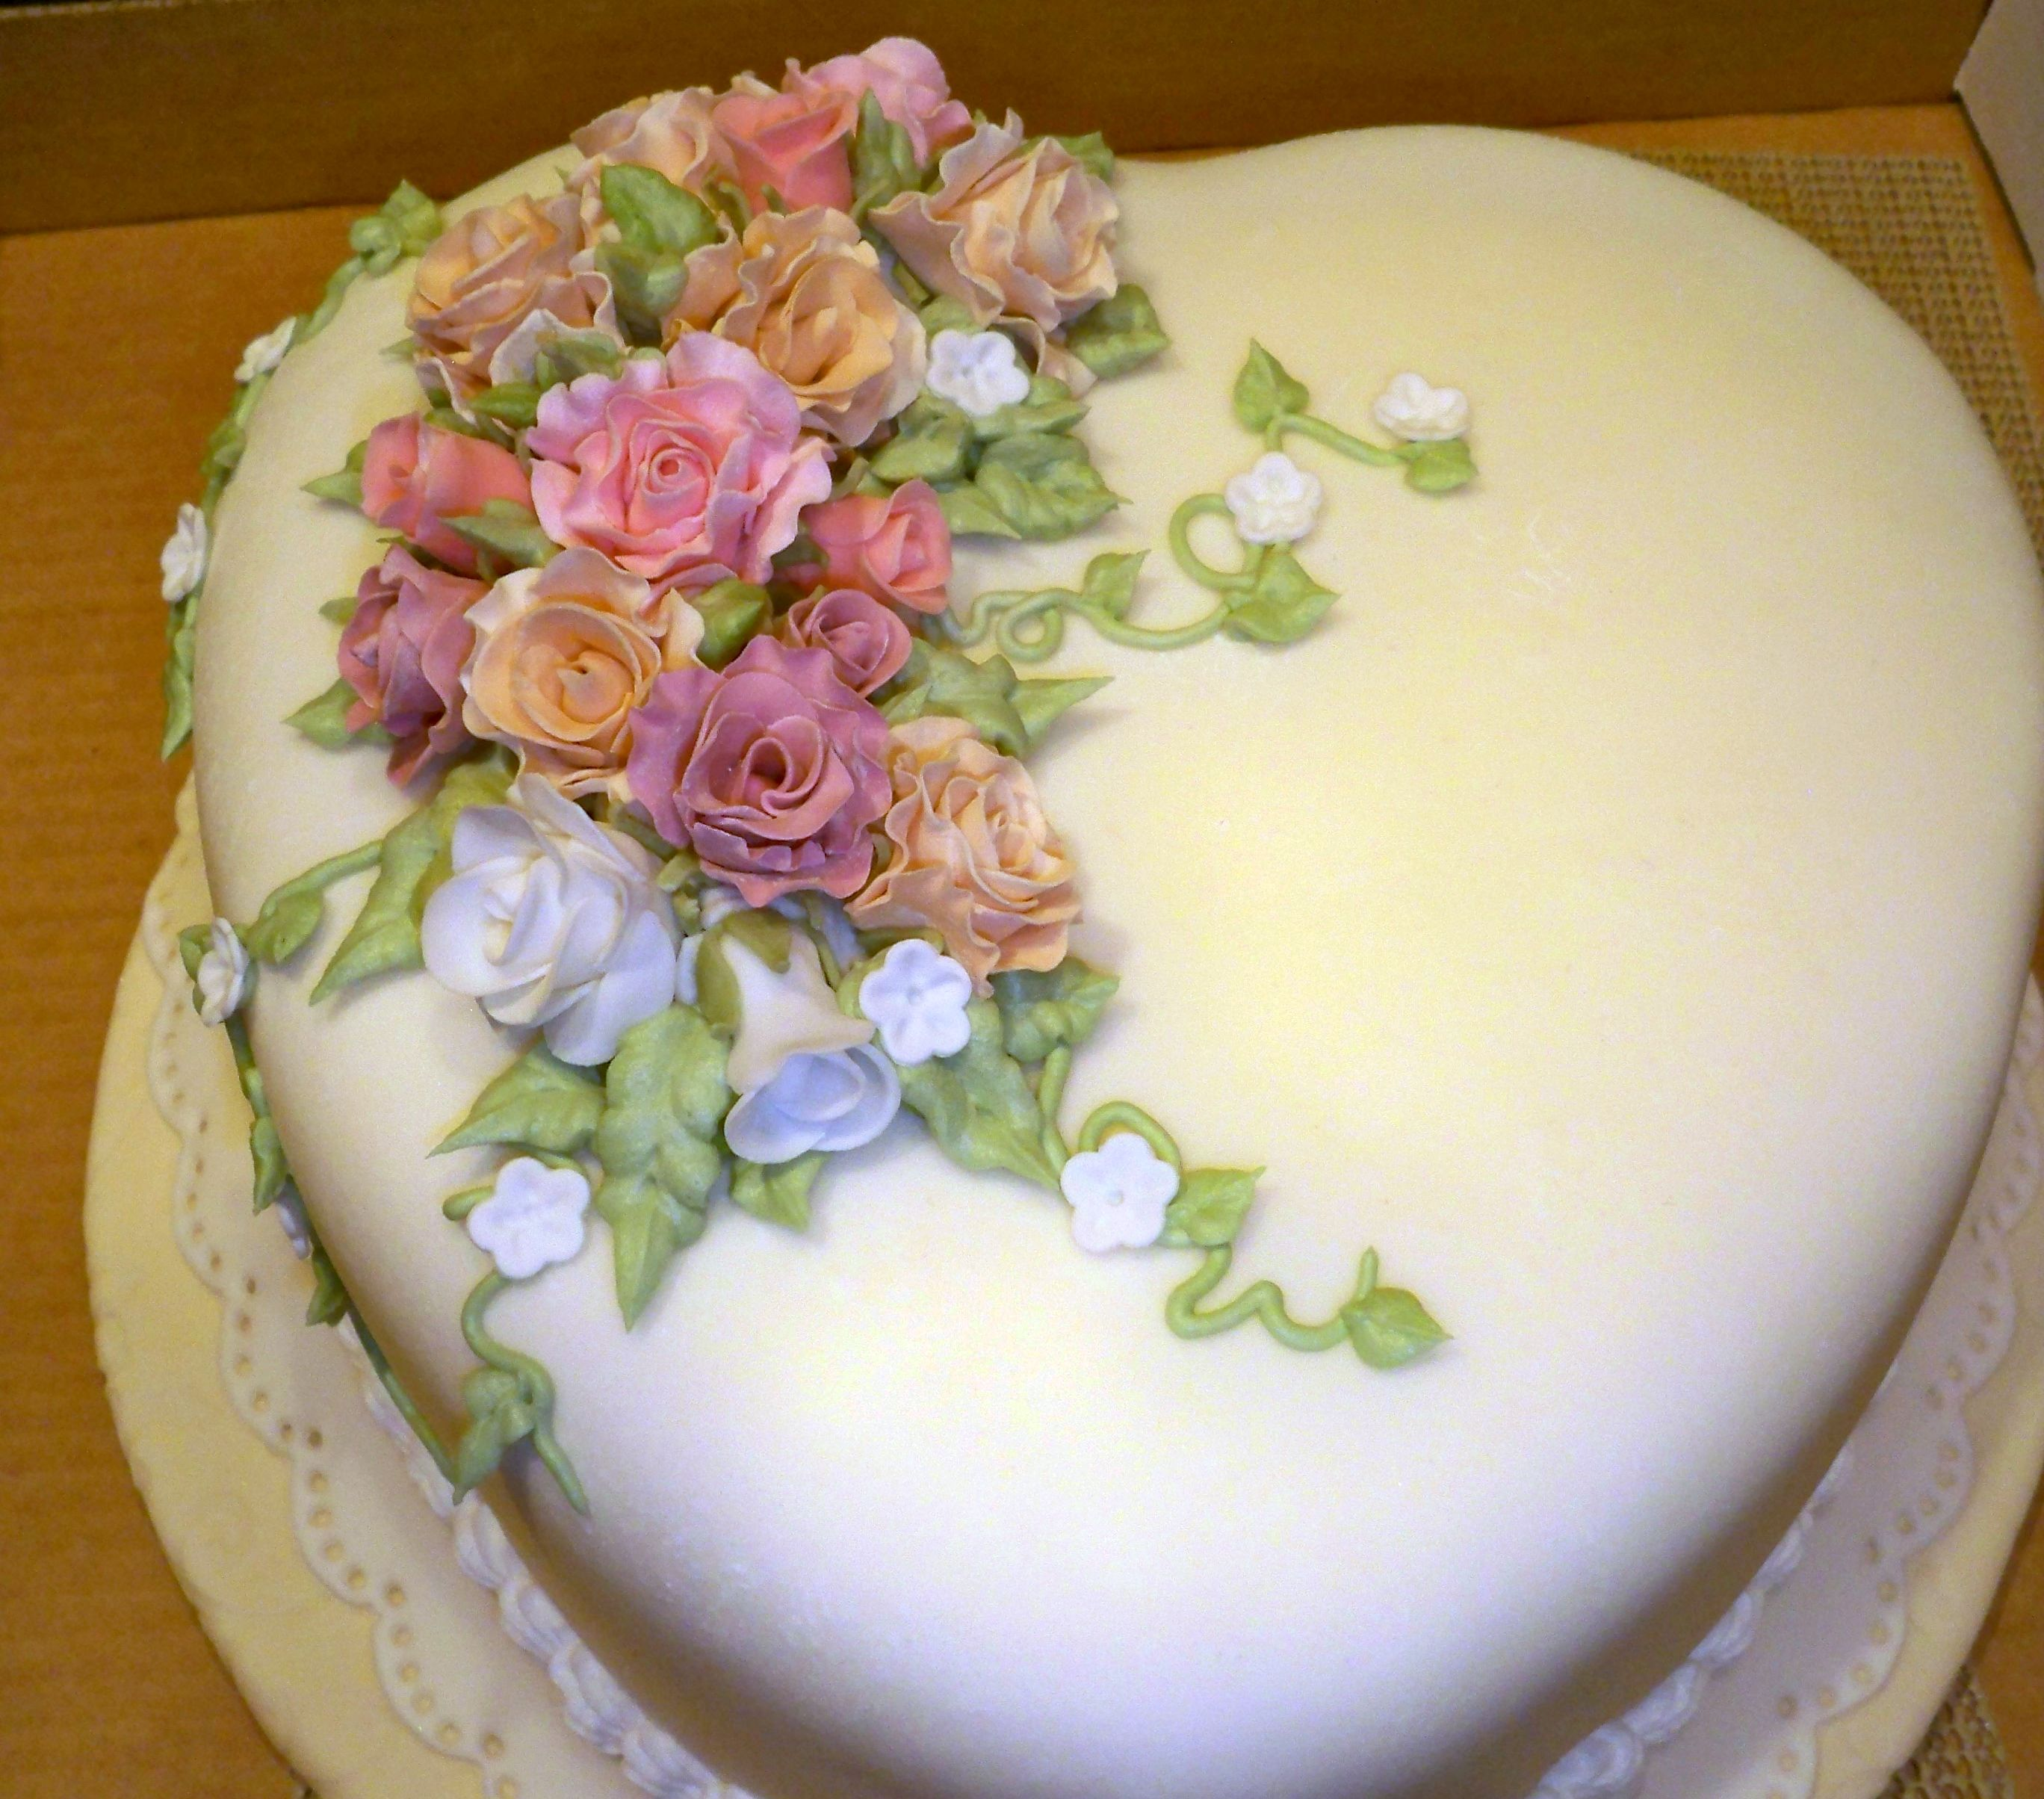 Fondant Covered Heart Cake W Roses Flowers Heart Shaped Cakes Rose Cake Cake Decorating